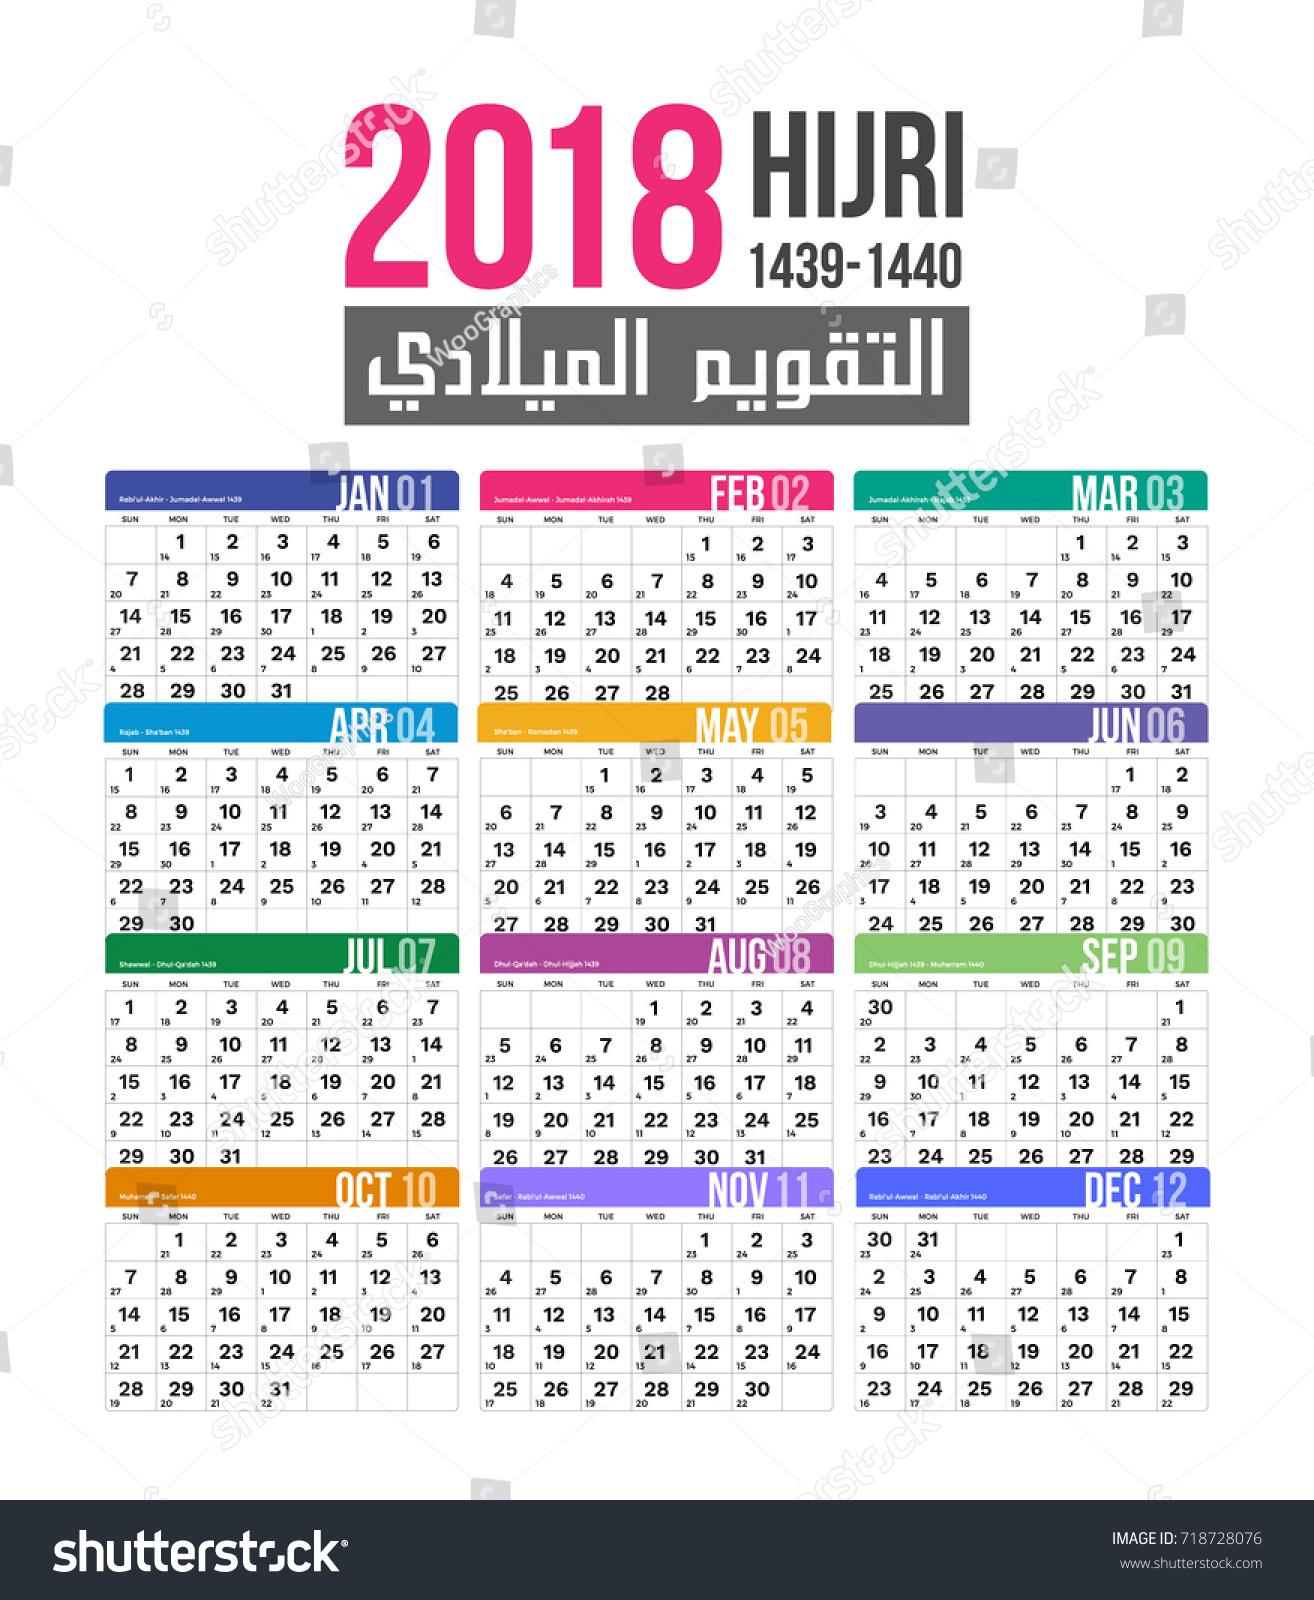 Hijri Calendar 1440 – Printable Month Calendar with 1440 Hijri Calendar